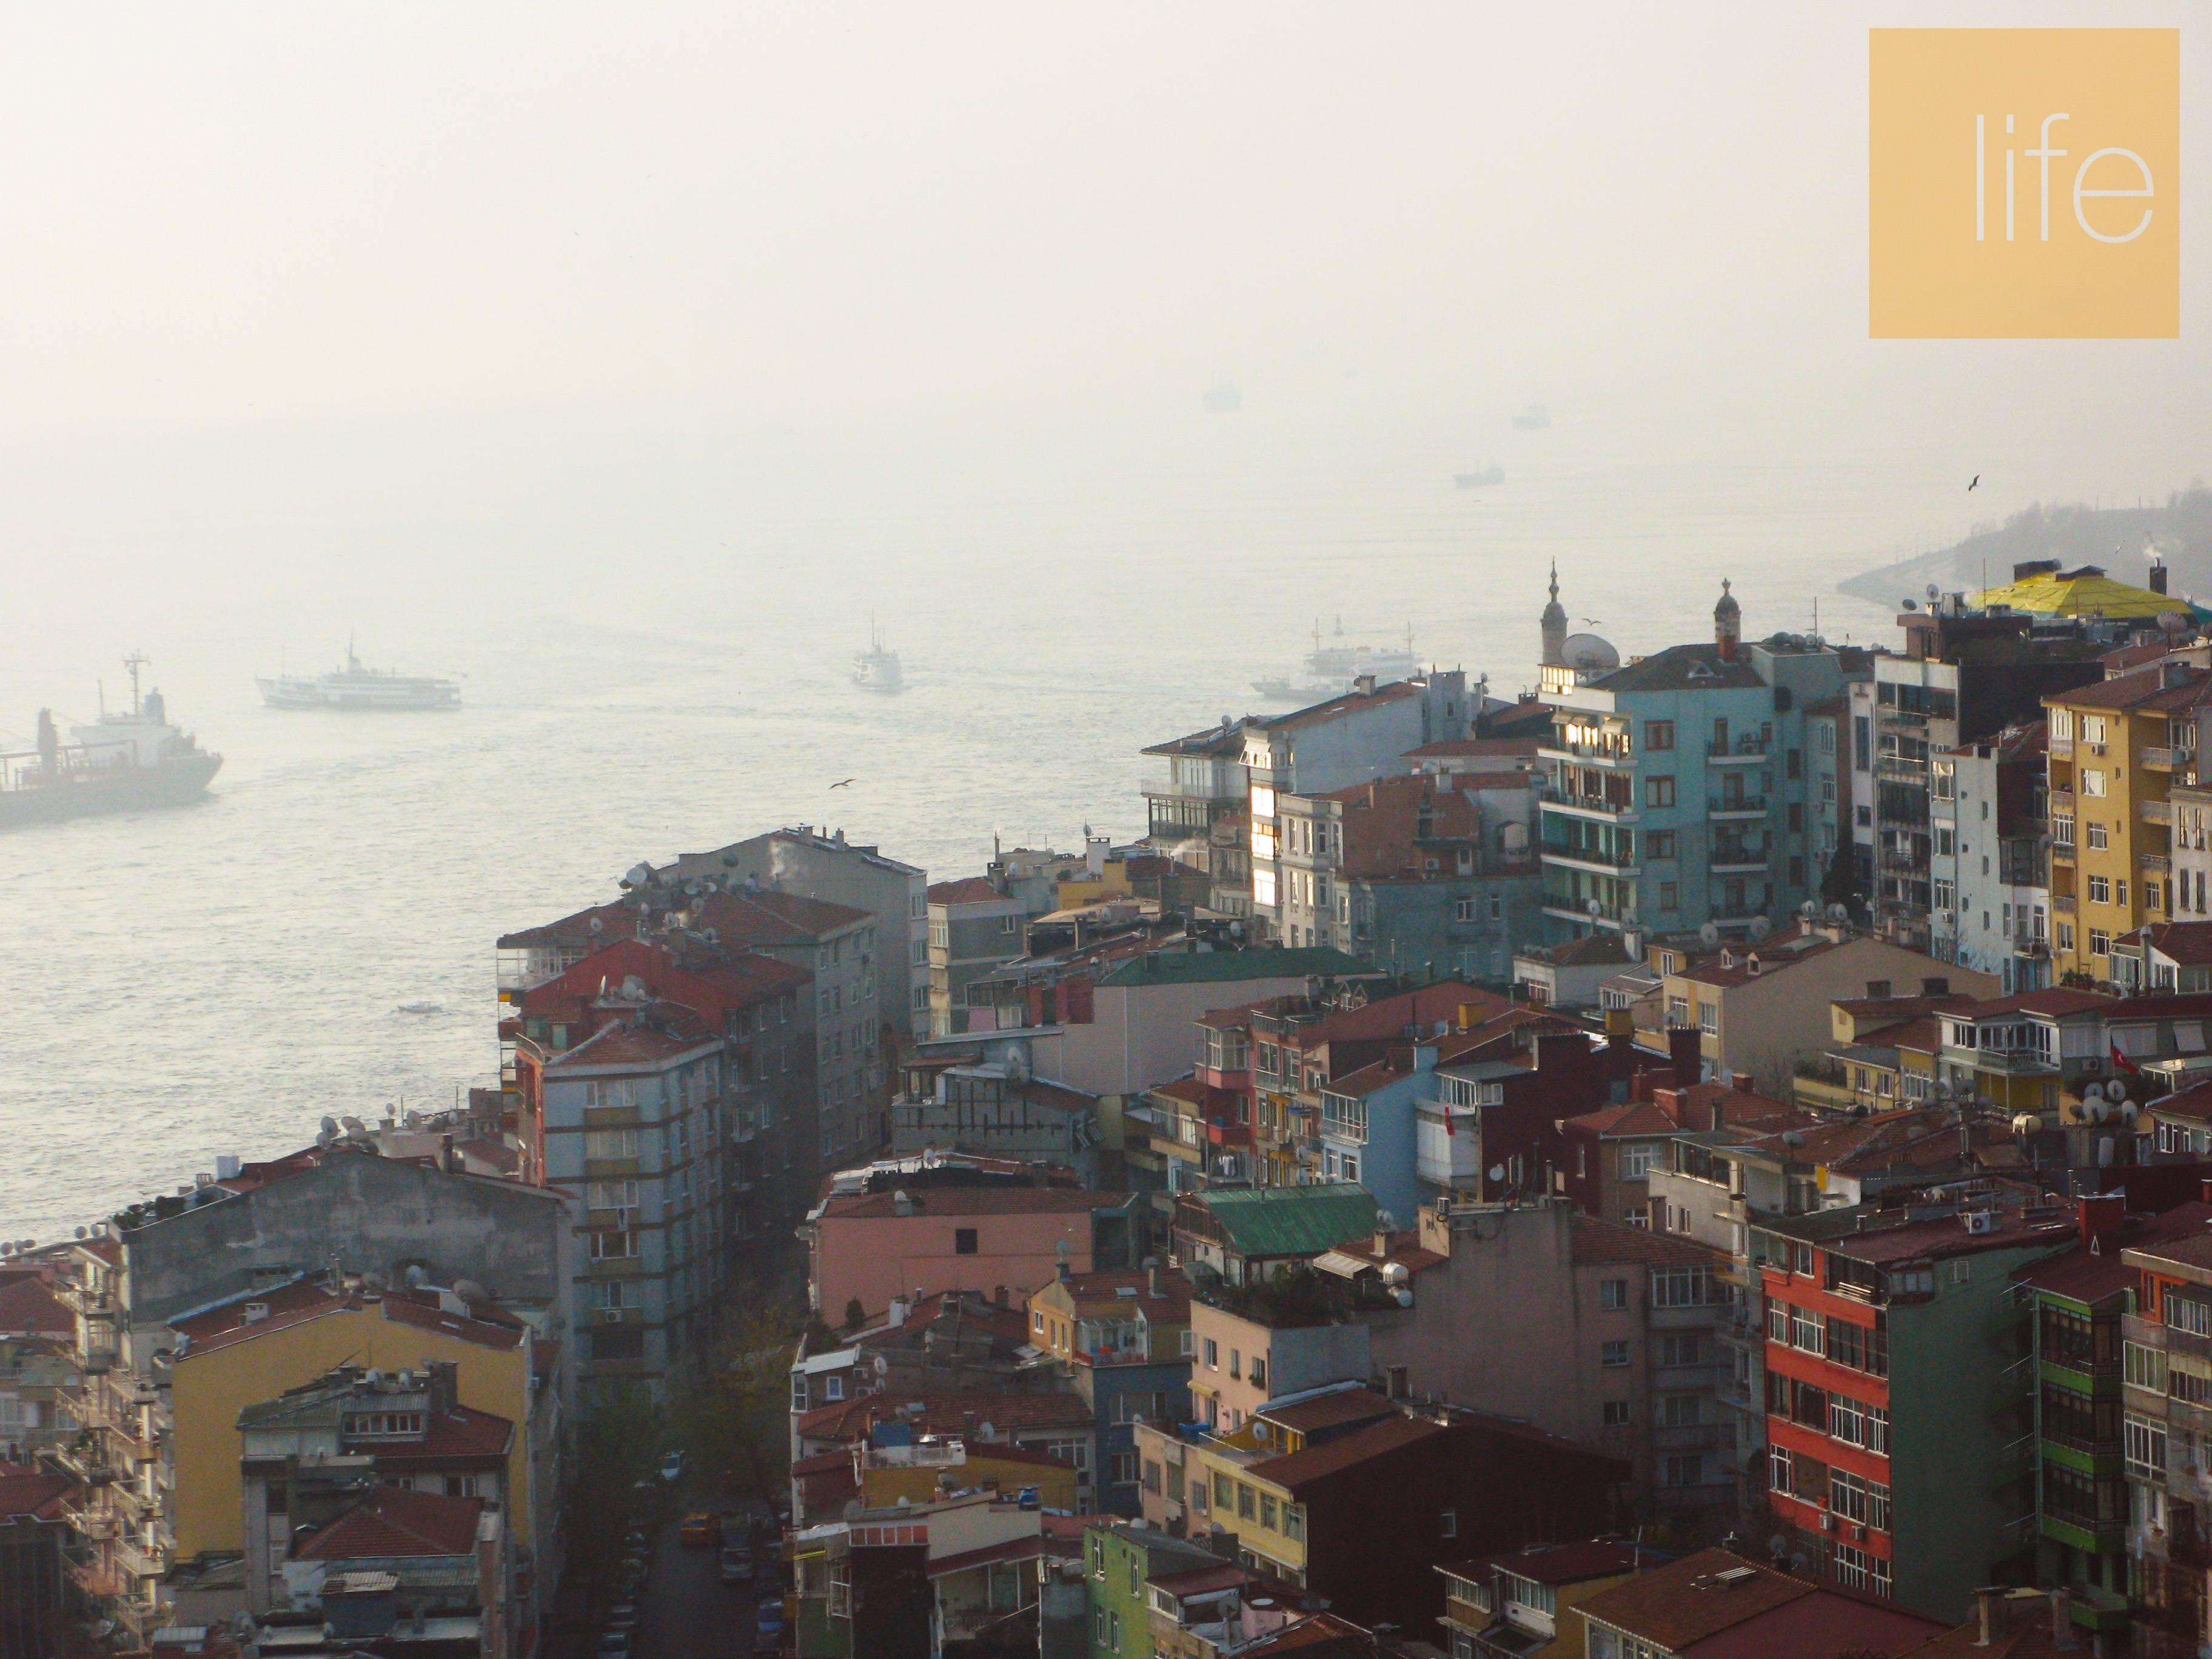 Istanbul- dragulj Bosfora